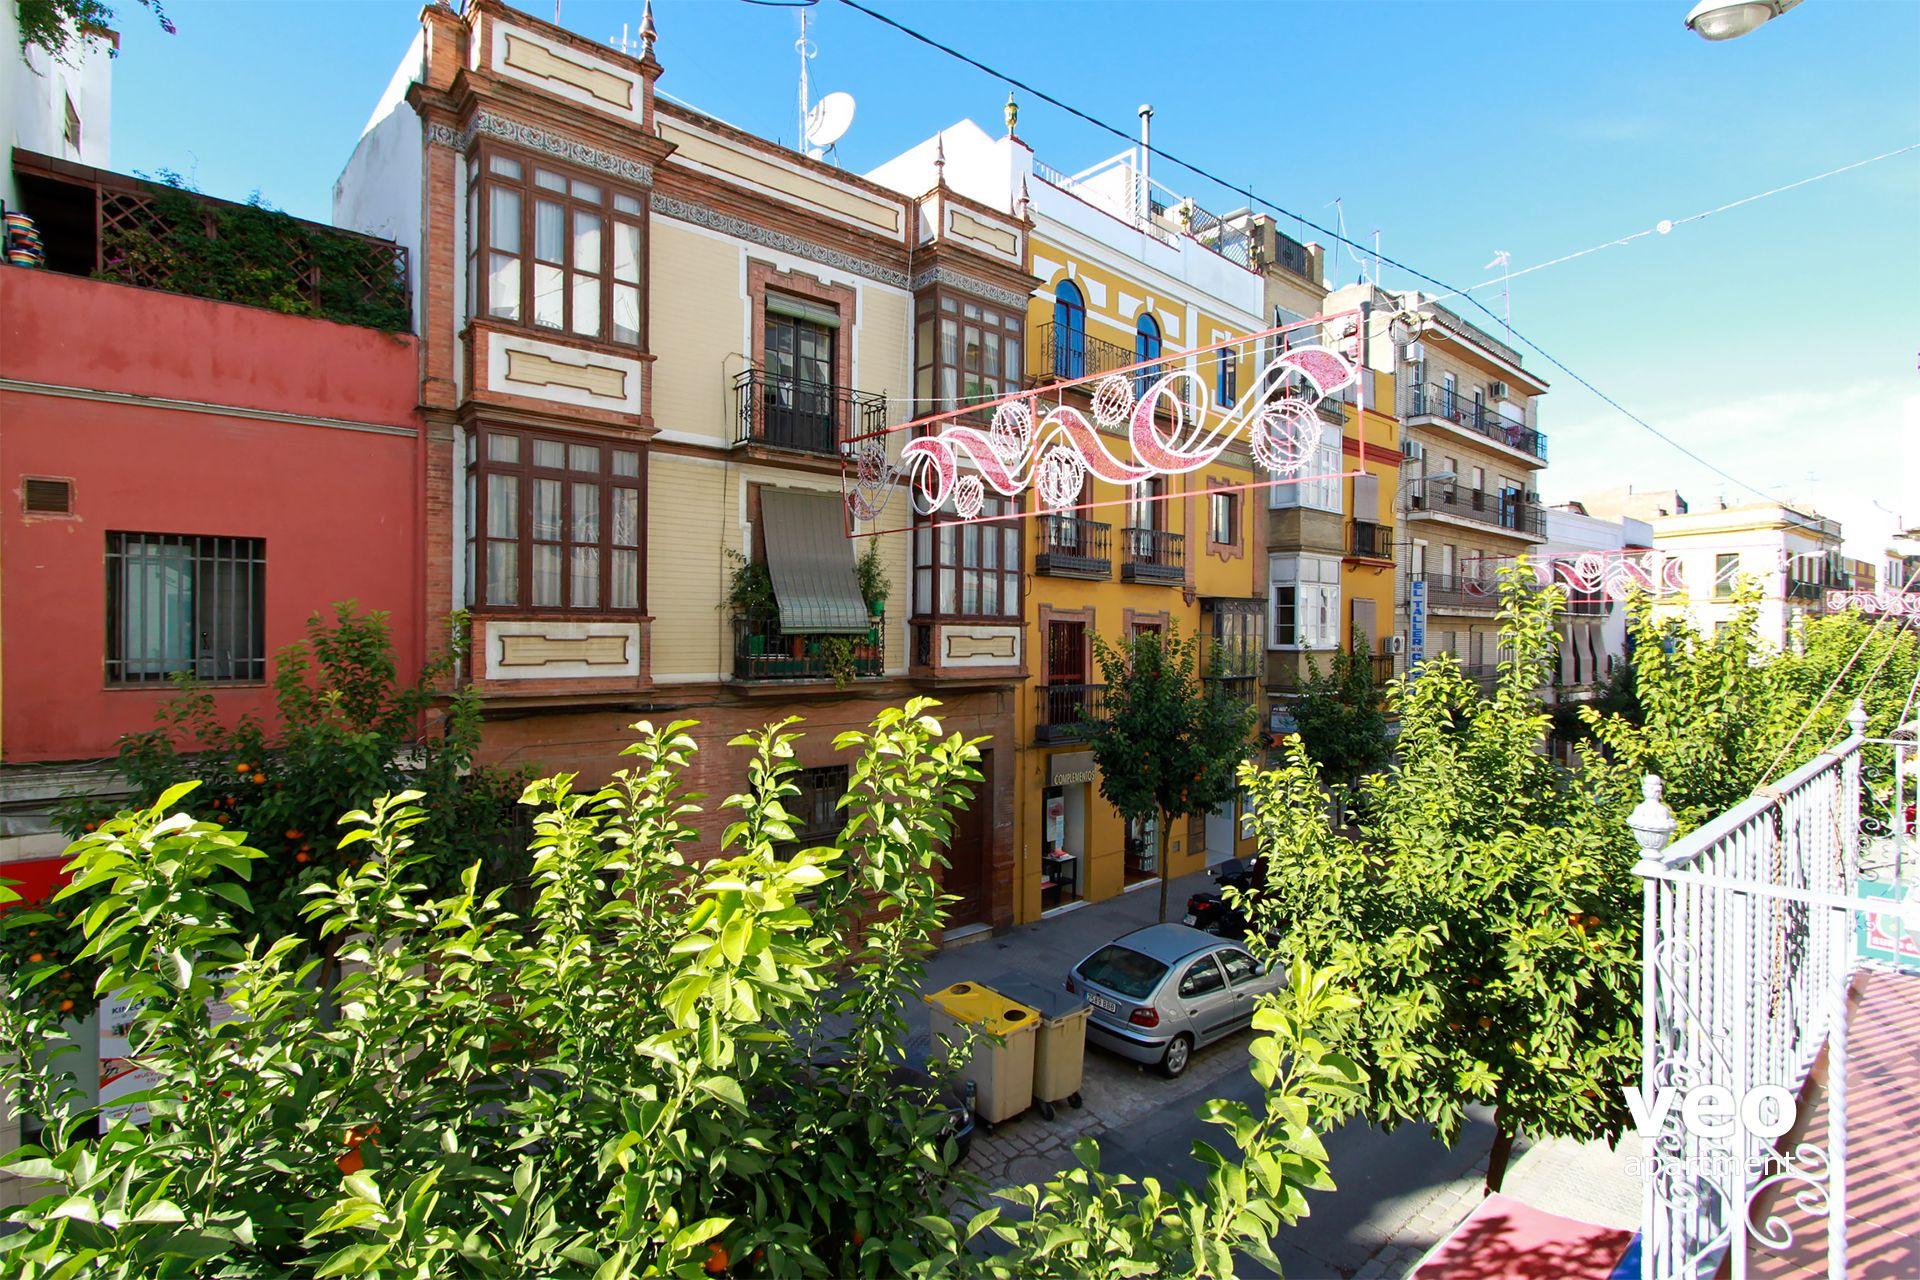 Appartement Rue Feria S Ville Espagne Feria 1a